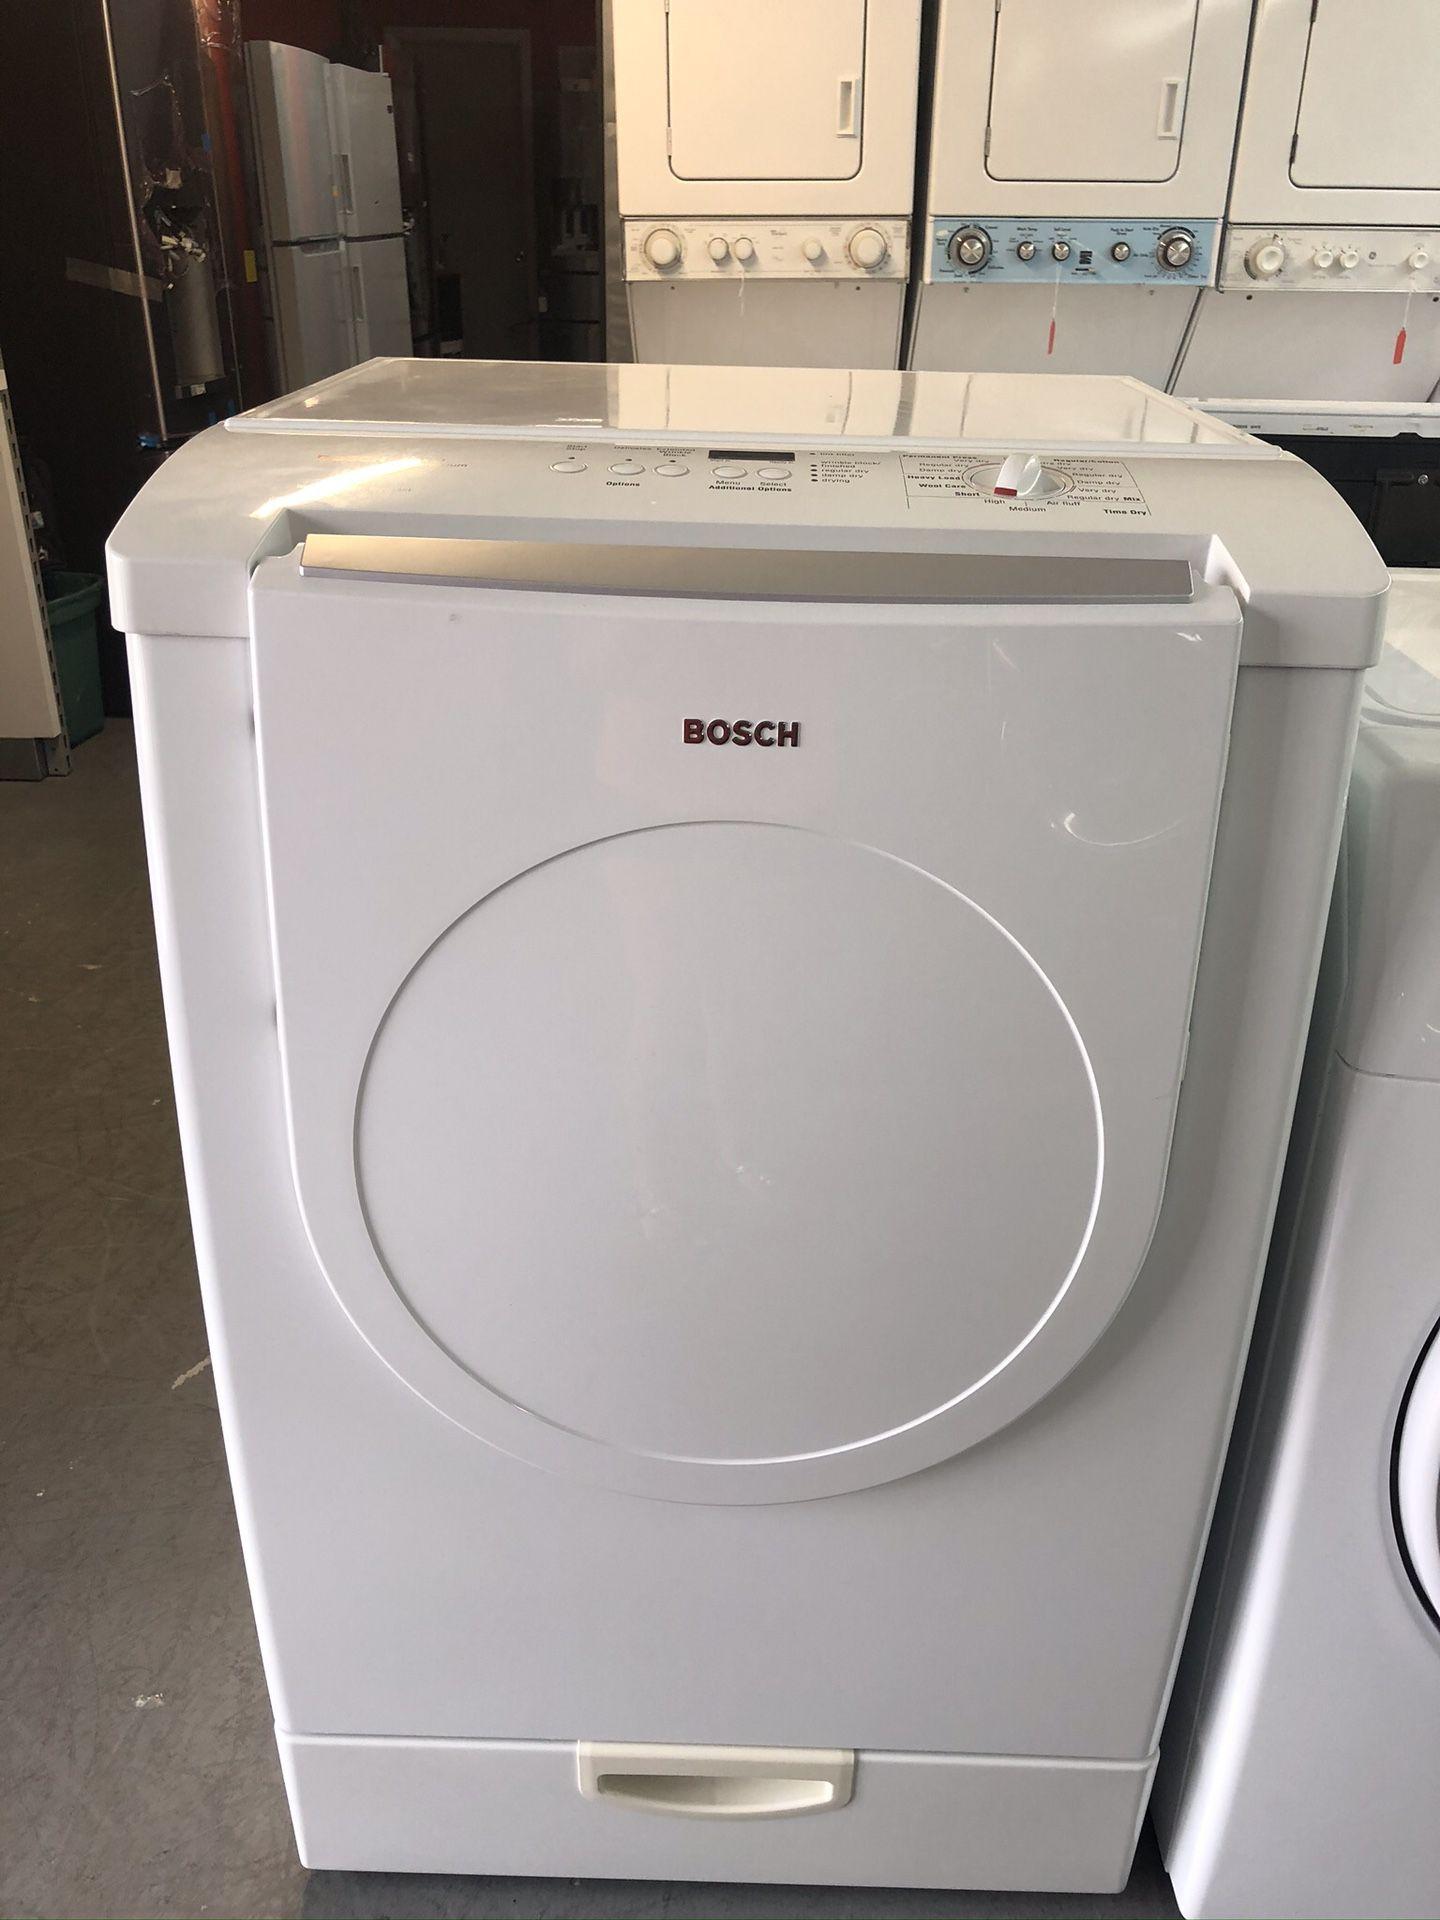 Used Bosch dryer. 1 year warranty